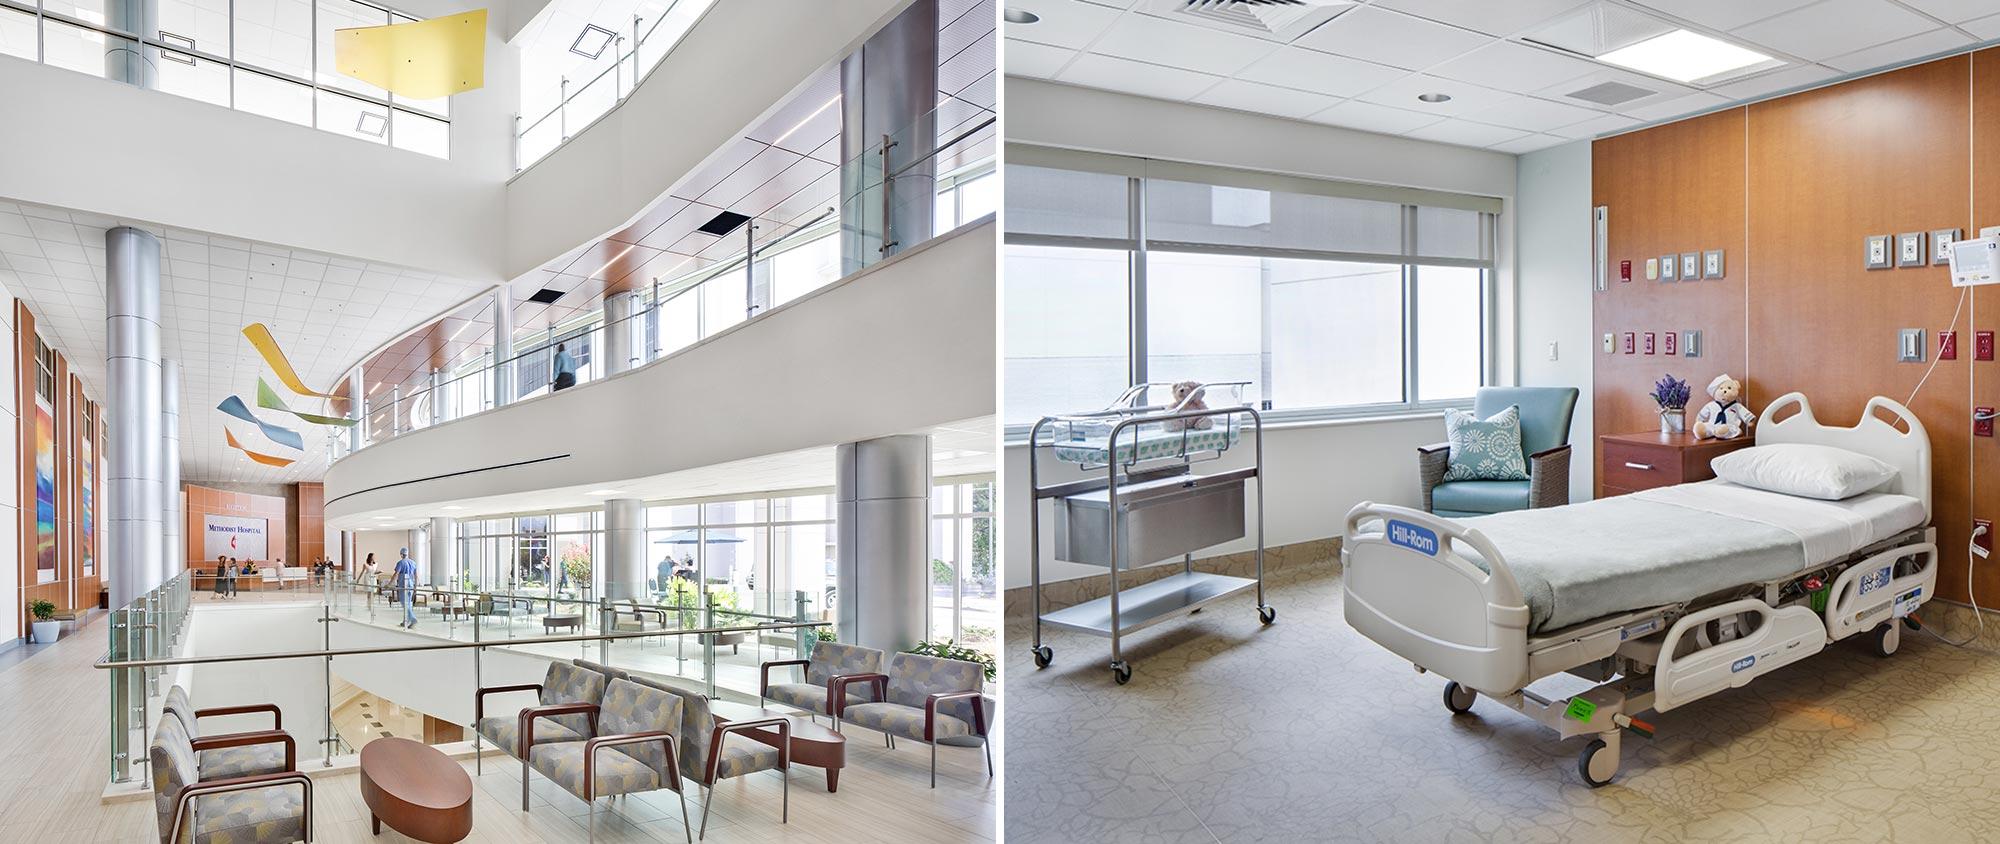 Methodist Hospital Central Tower – ESa